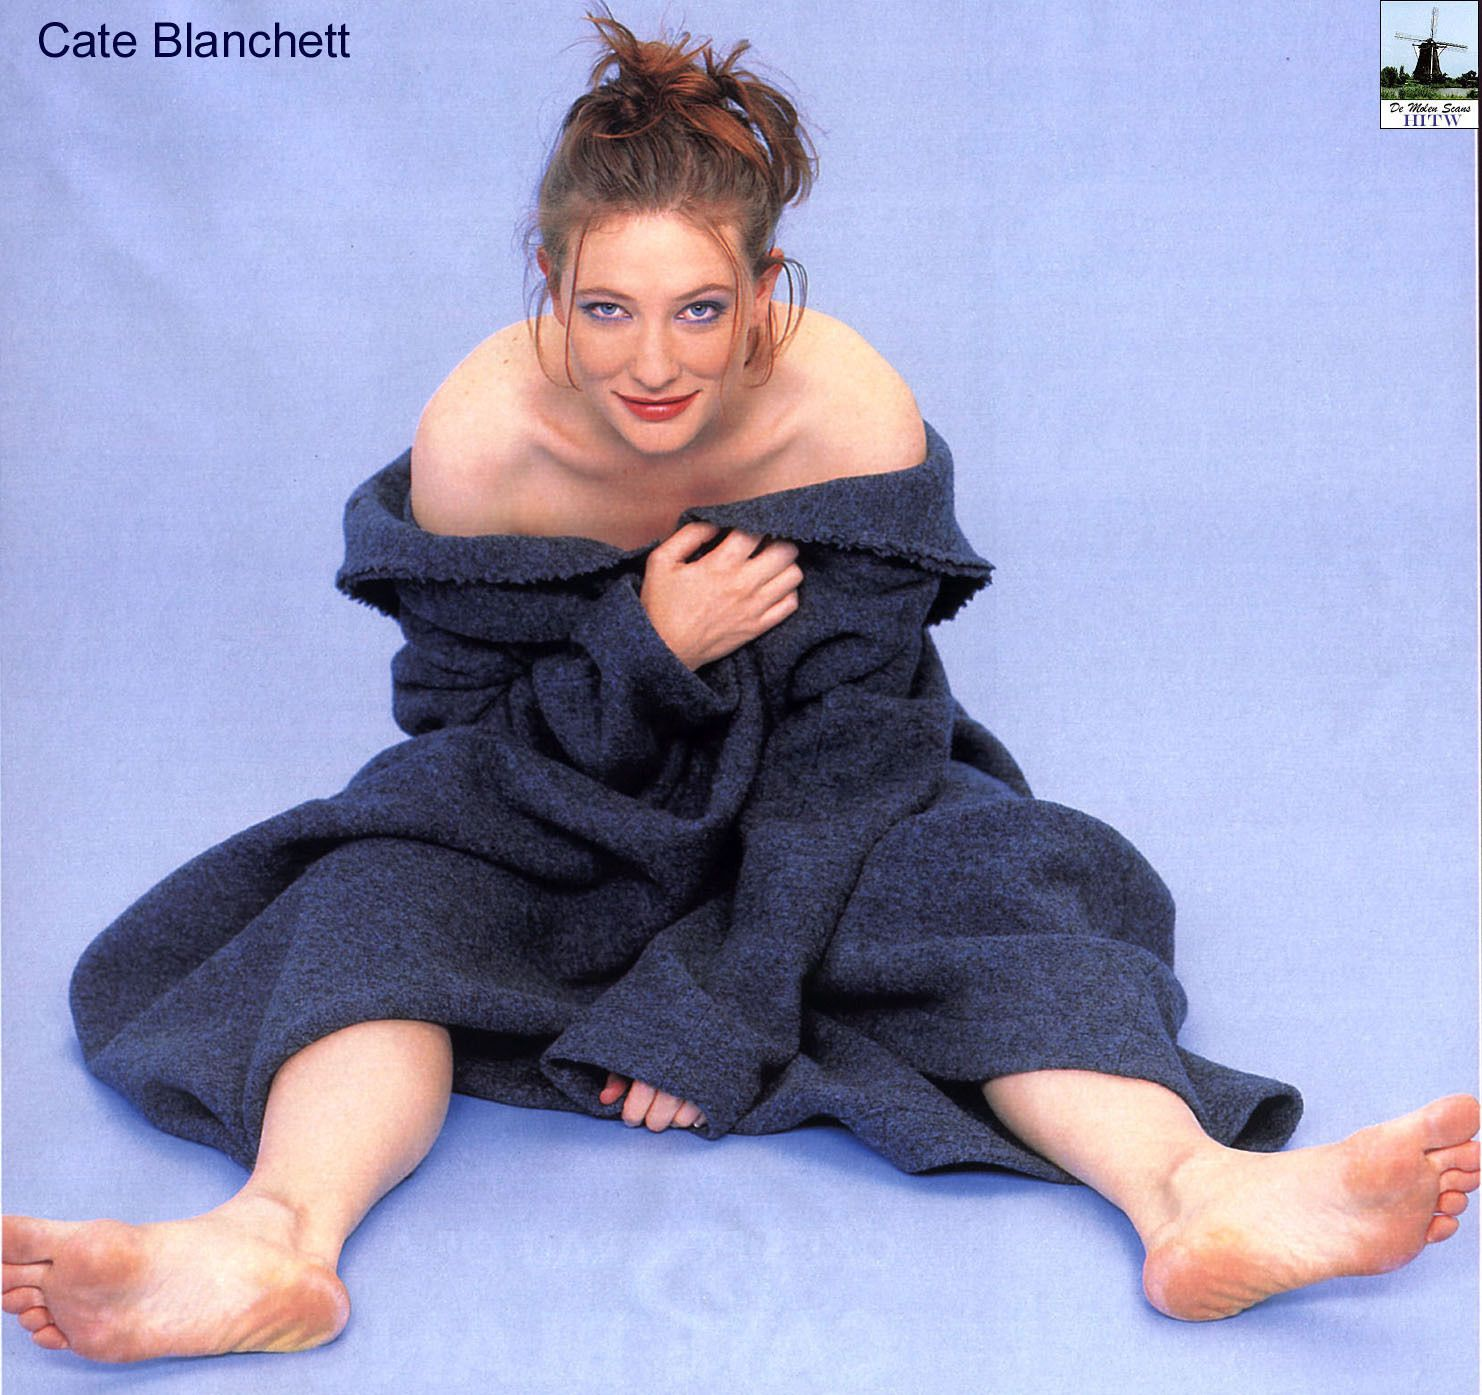 Feet Cate Blanchett naked (89 photo), Tits, Paparazzi, Feet, bra 2017